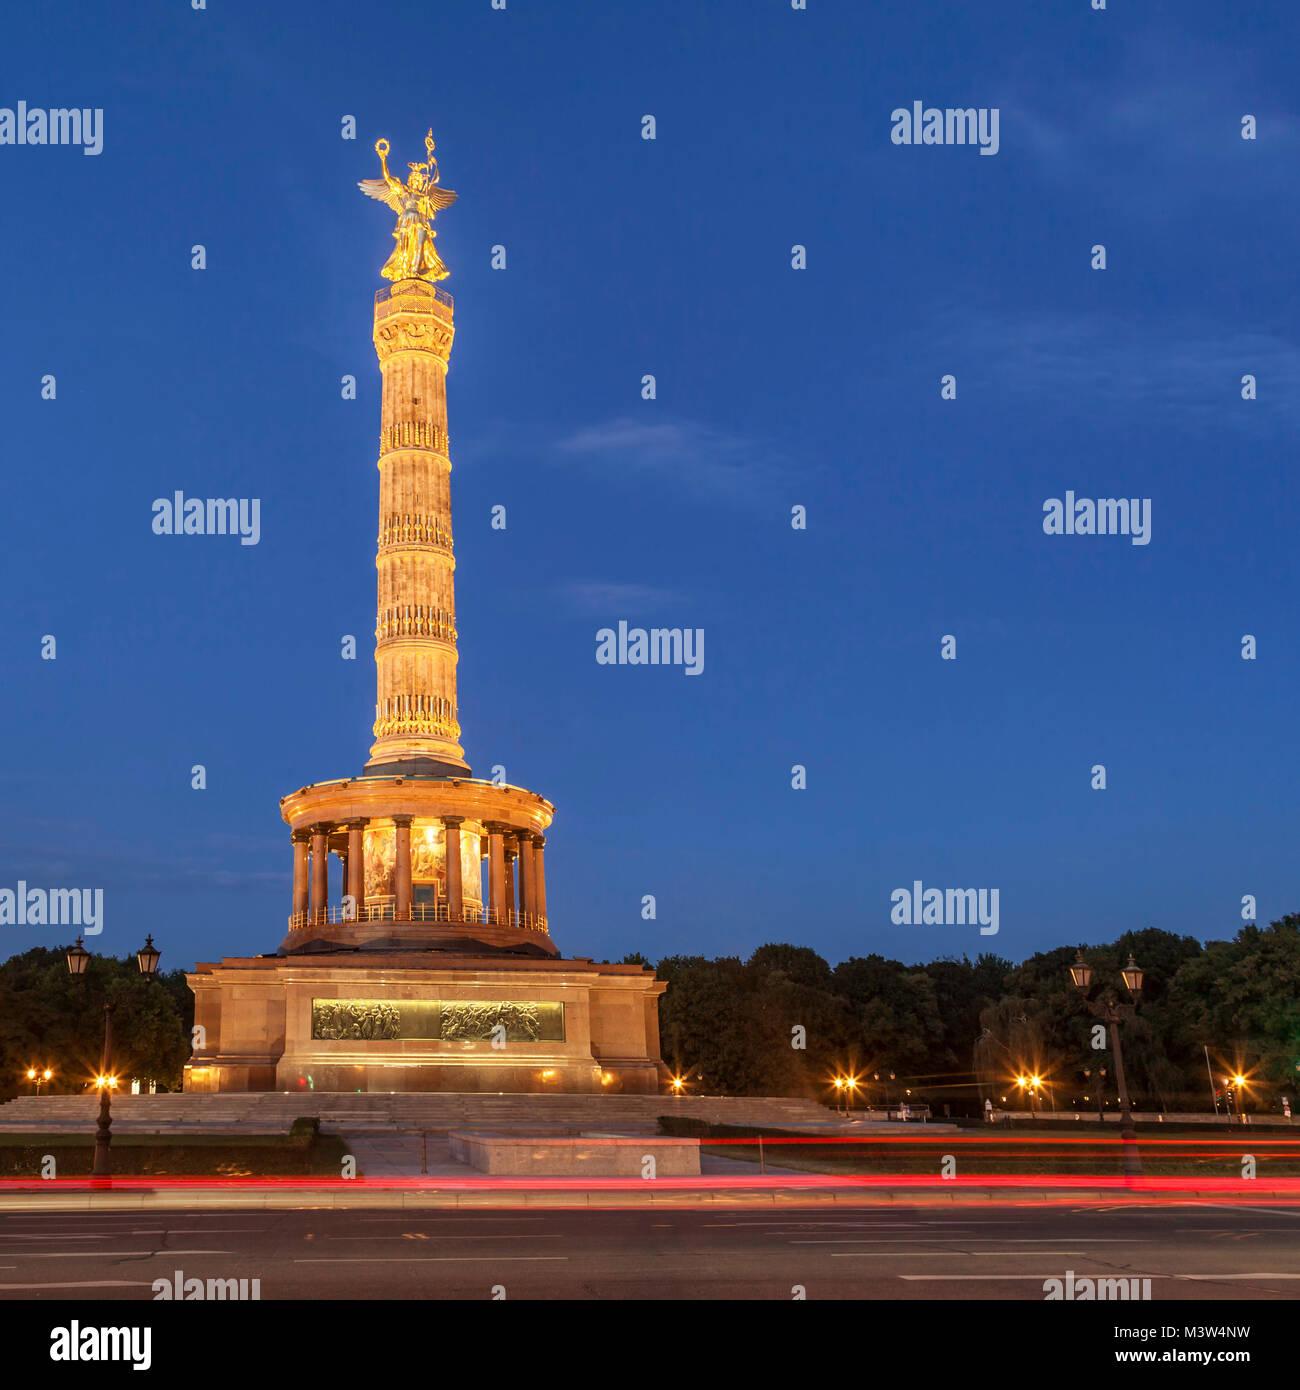 Victory column, Siegessaeule, Grosser Stern, Tiergarten, traffic, twilight, - Stock Image